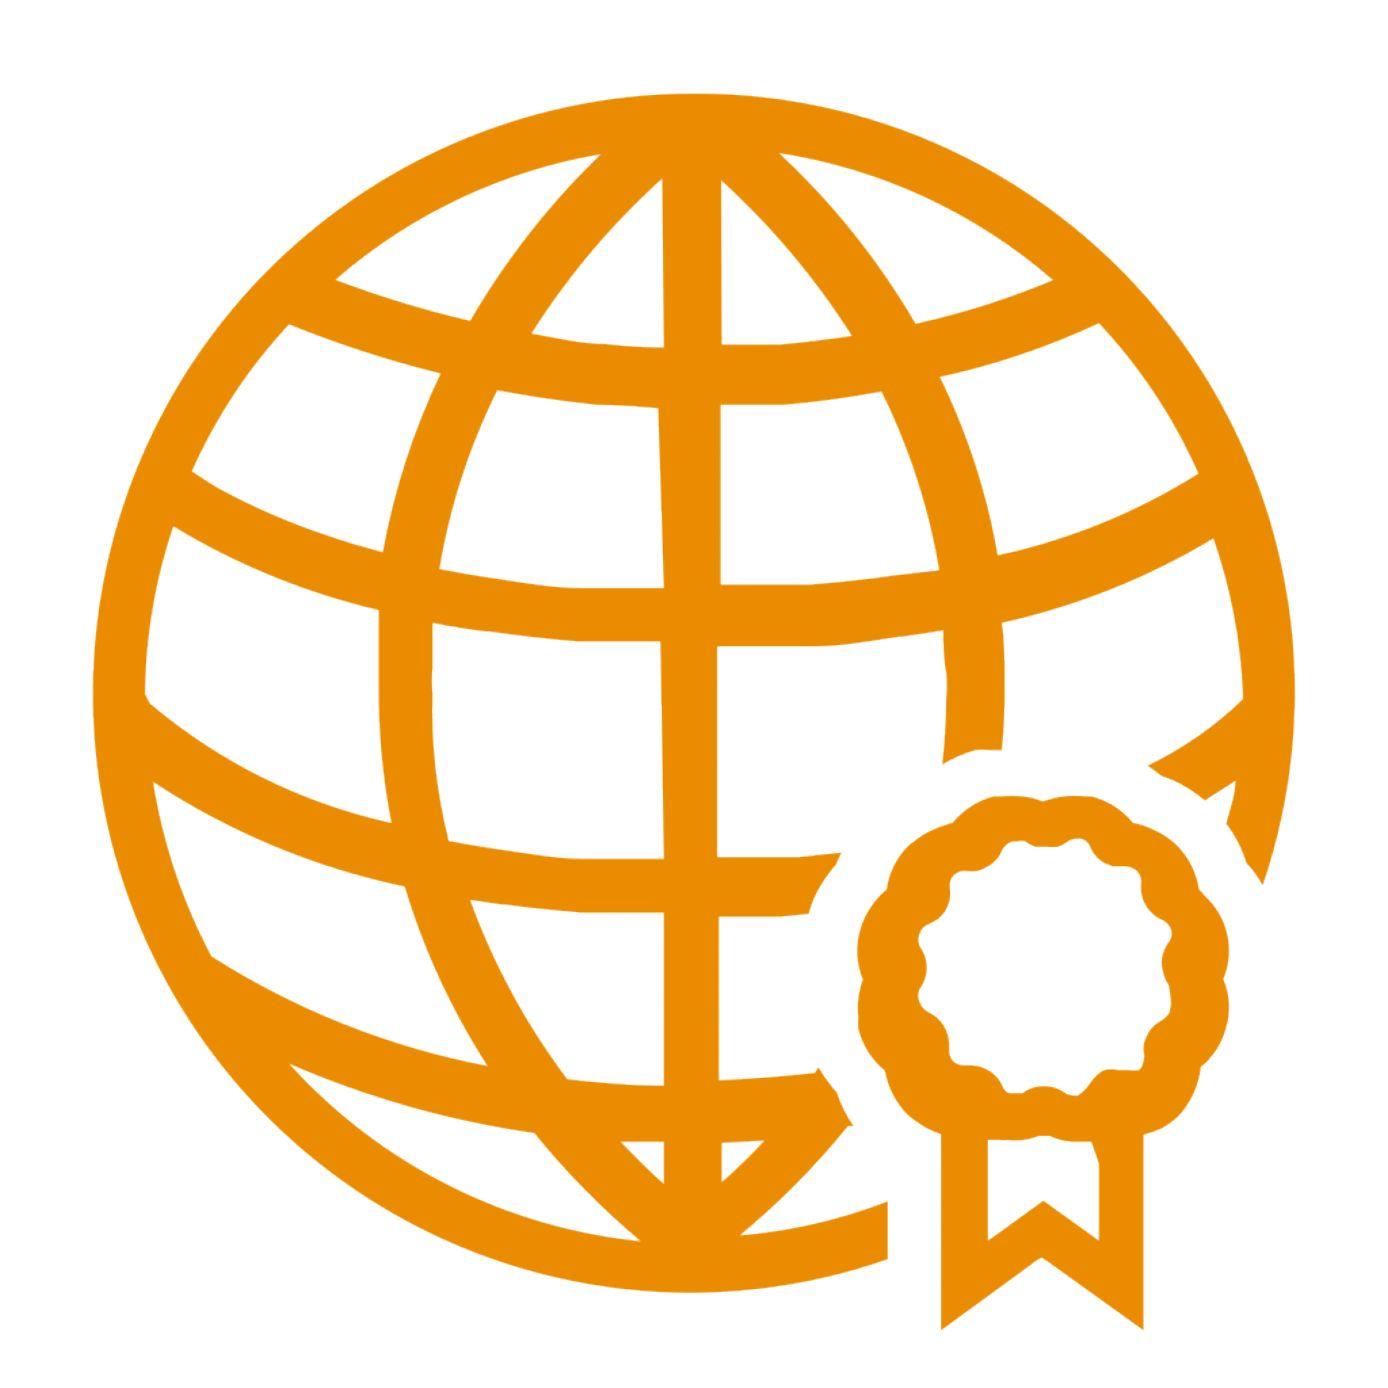 Weidmüller Certification Service